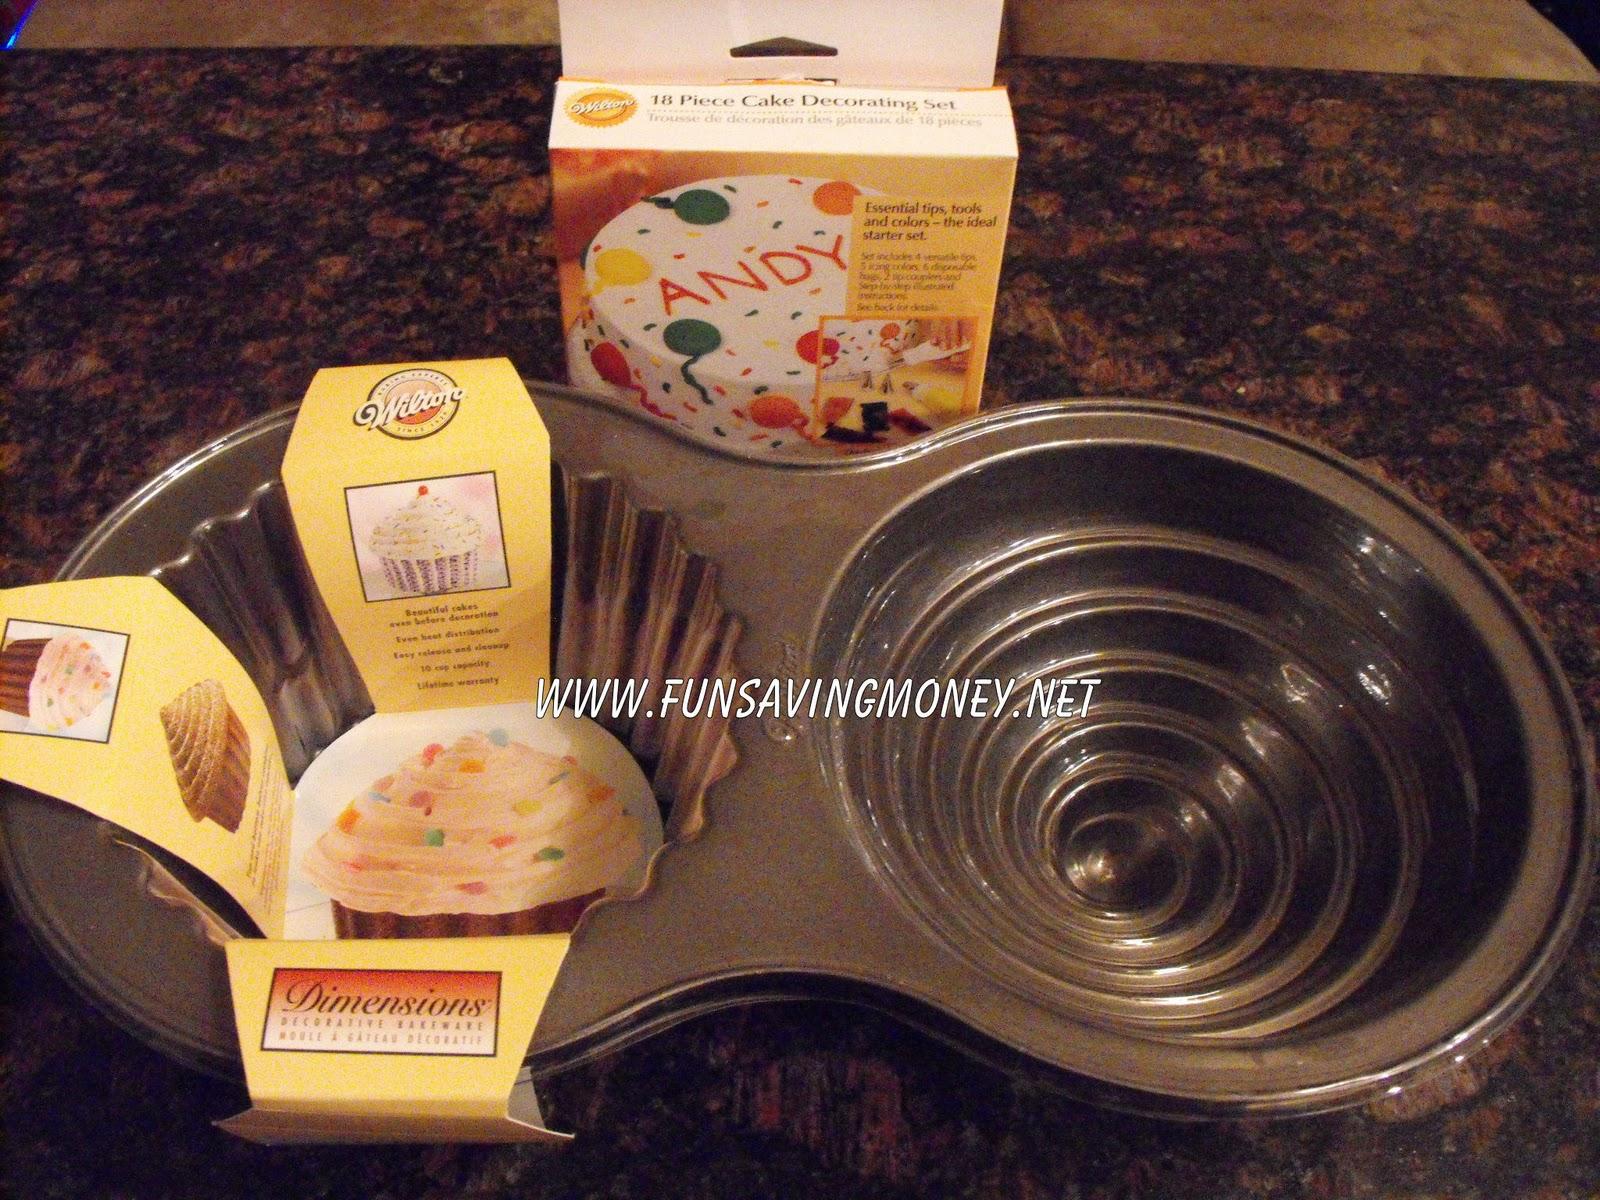 Big Birthday Bash Wilton Dimensions Giant Cupcake Pan And